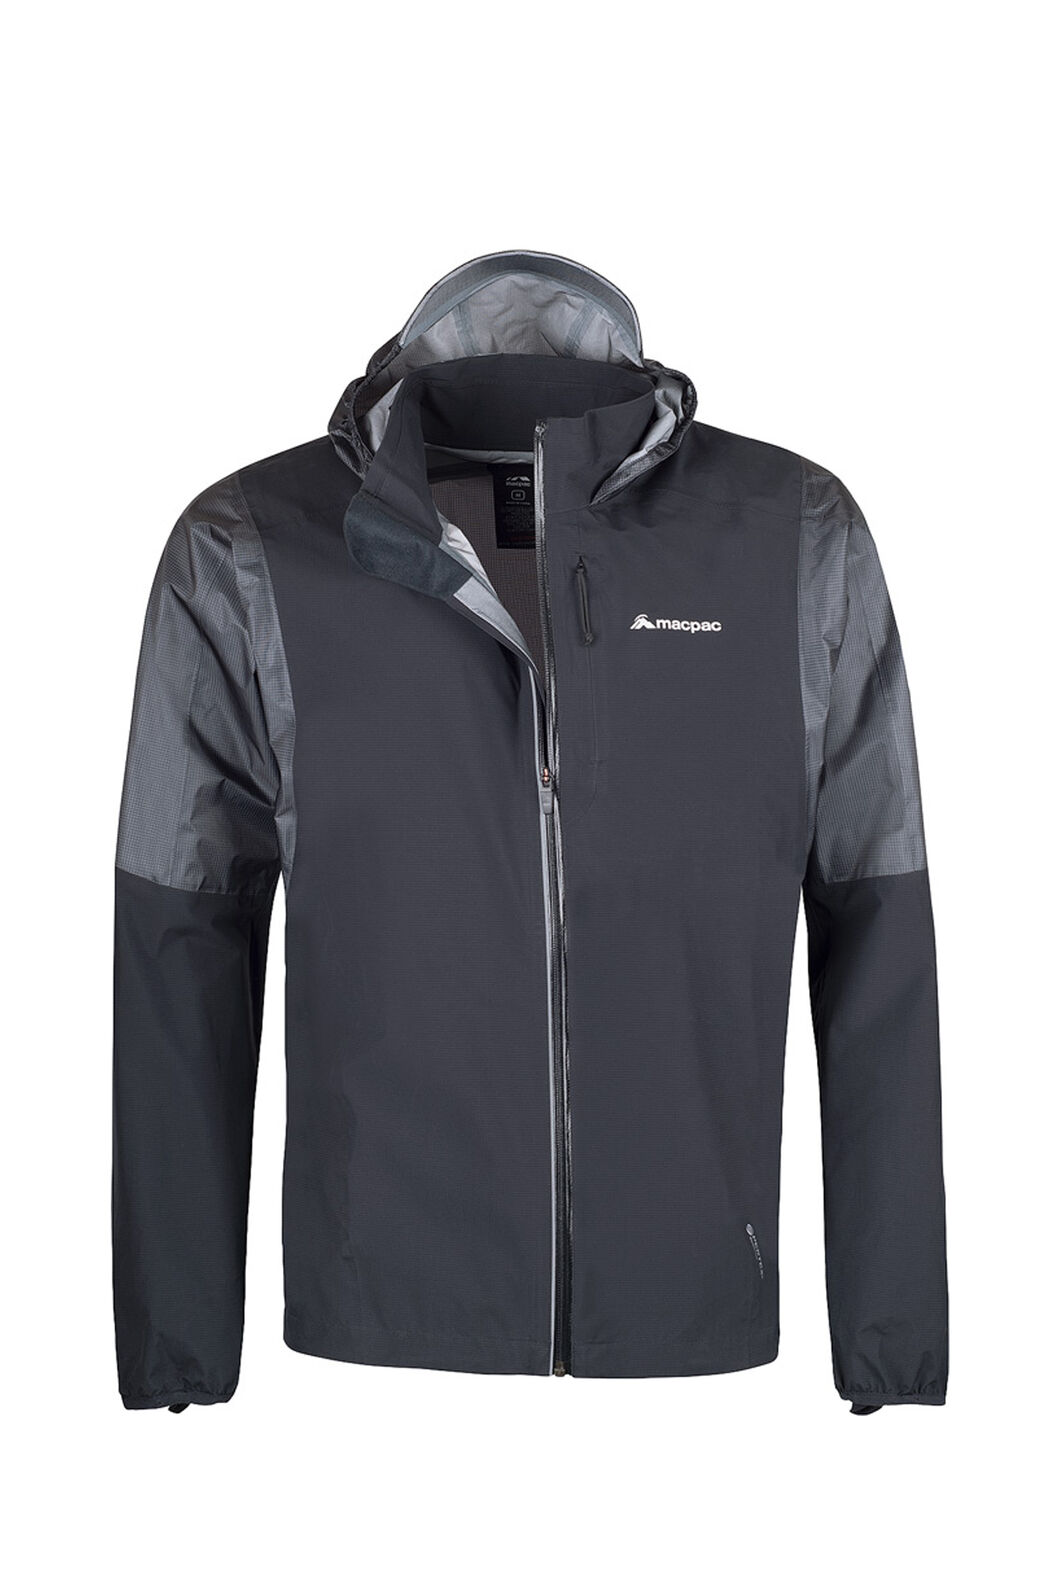 Macpac Transition Pertex® Rain Jacket - Men's, Black, hi-res